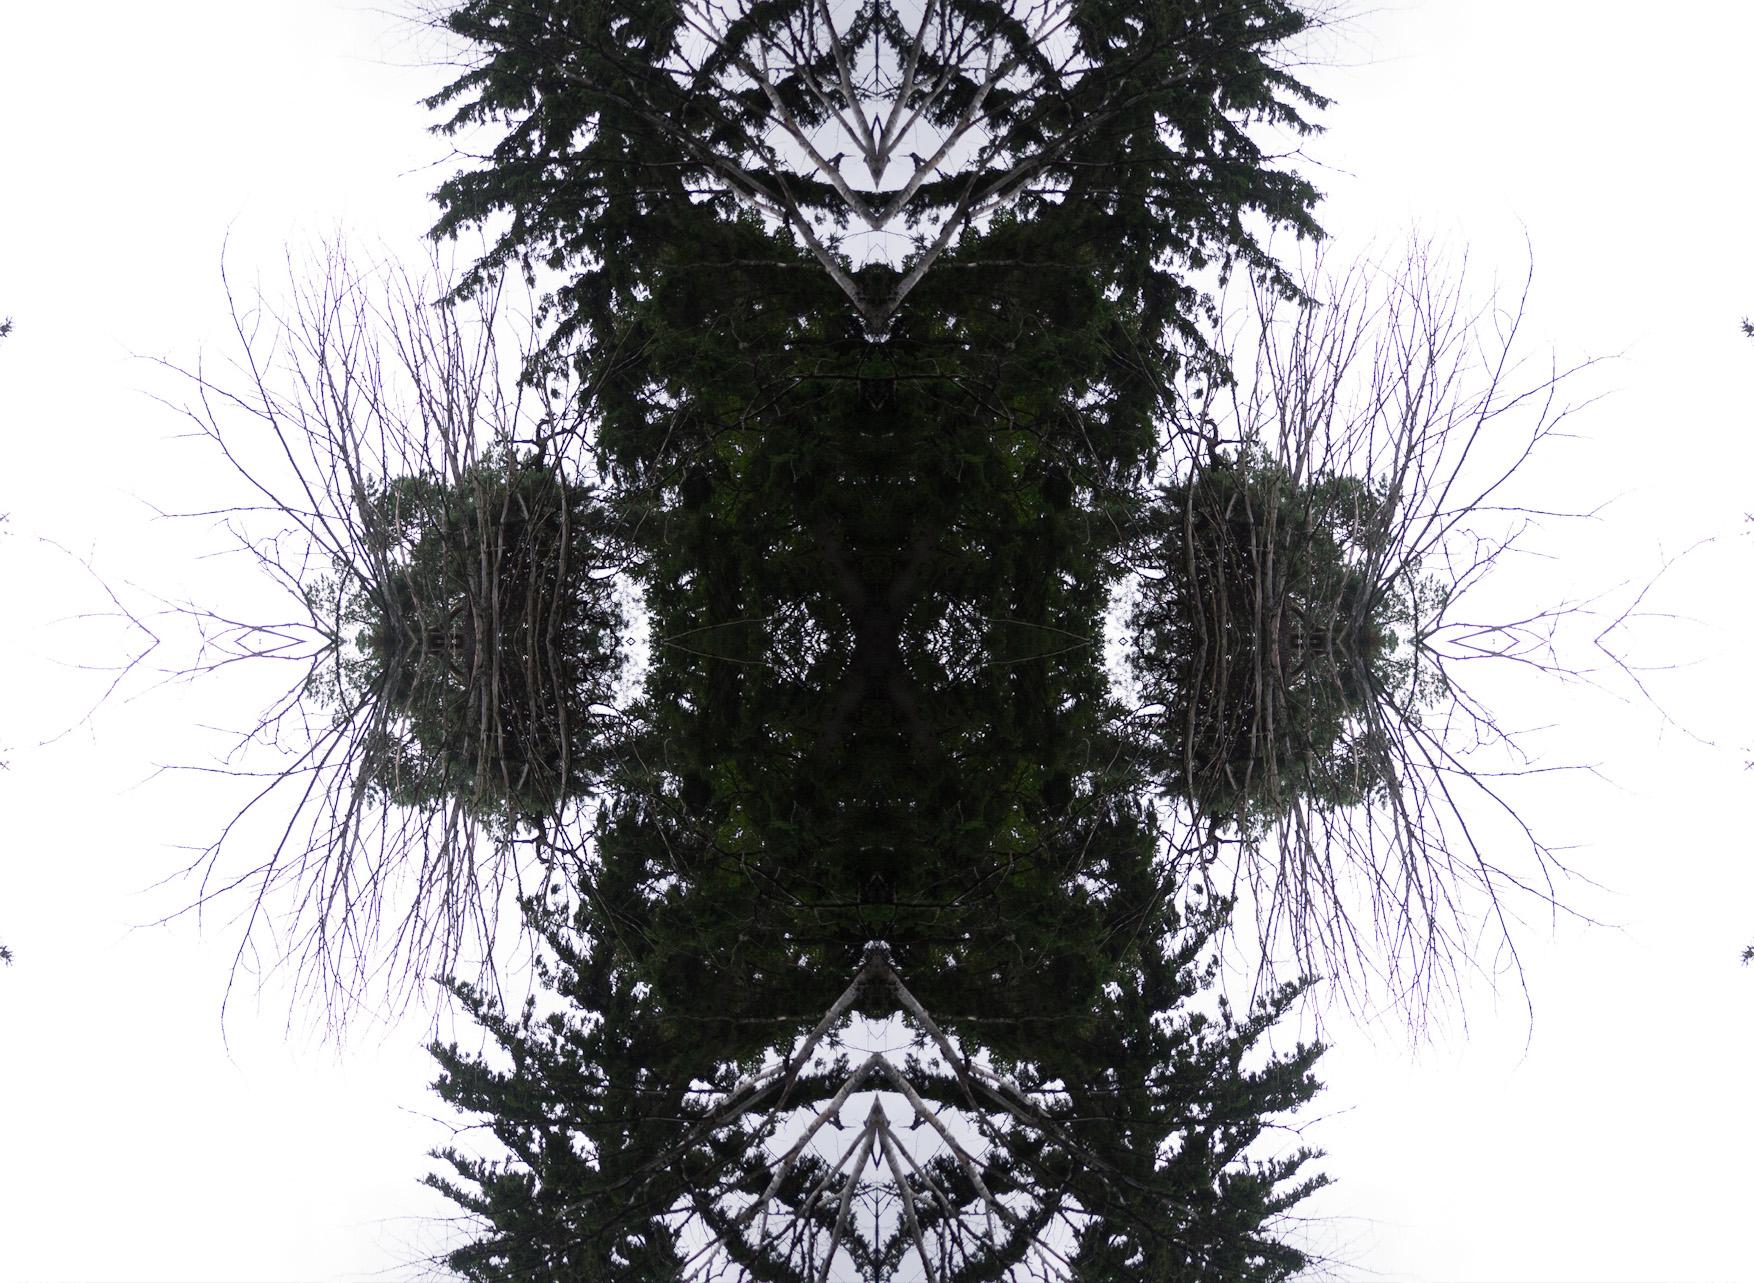 P1020651.jpg